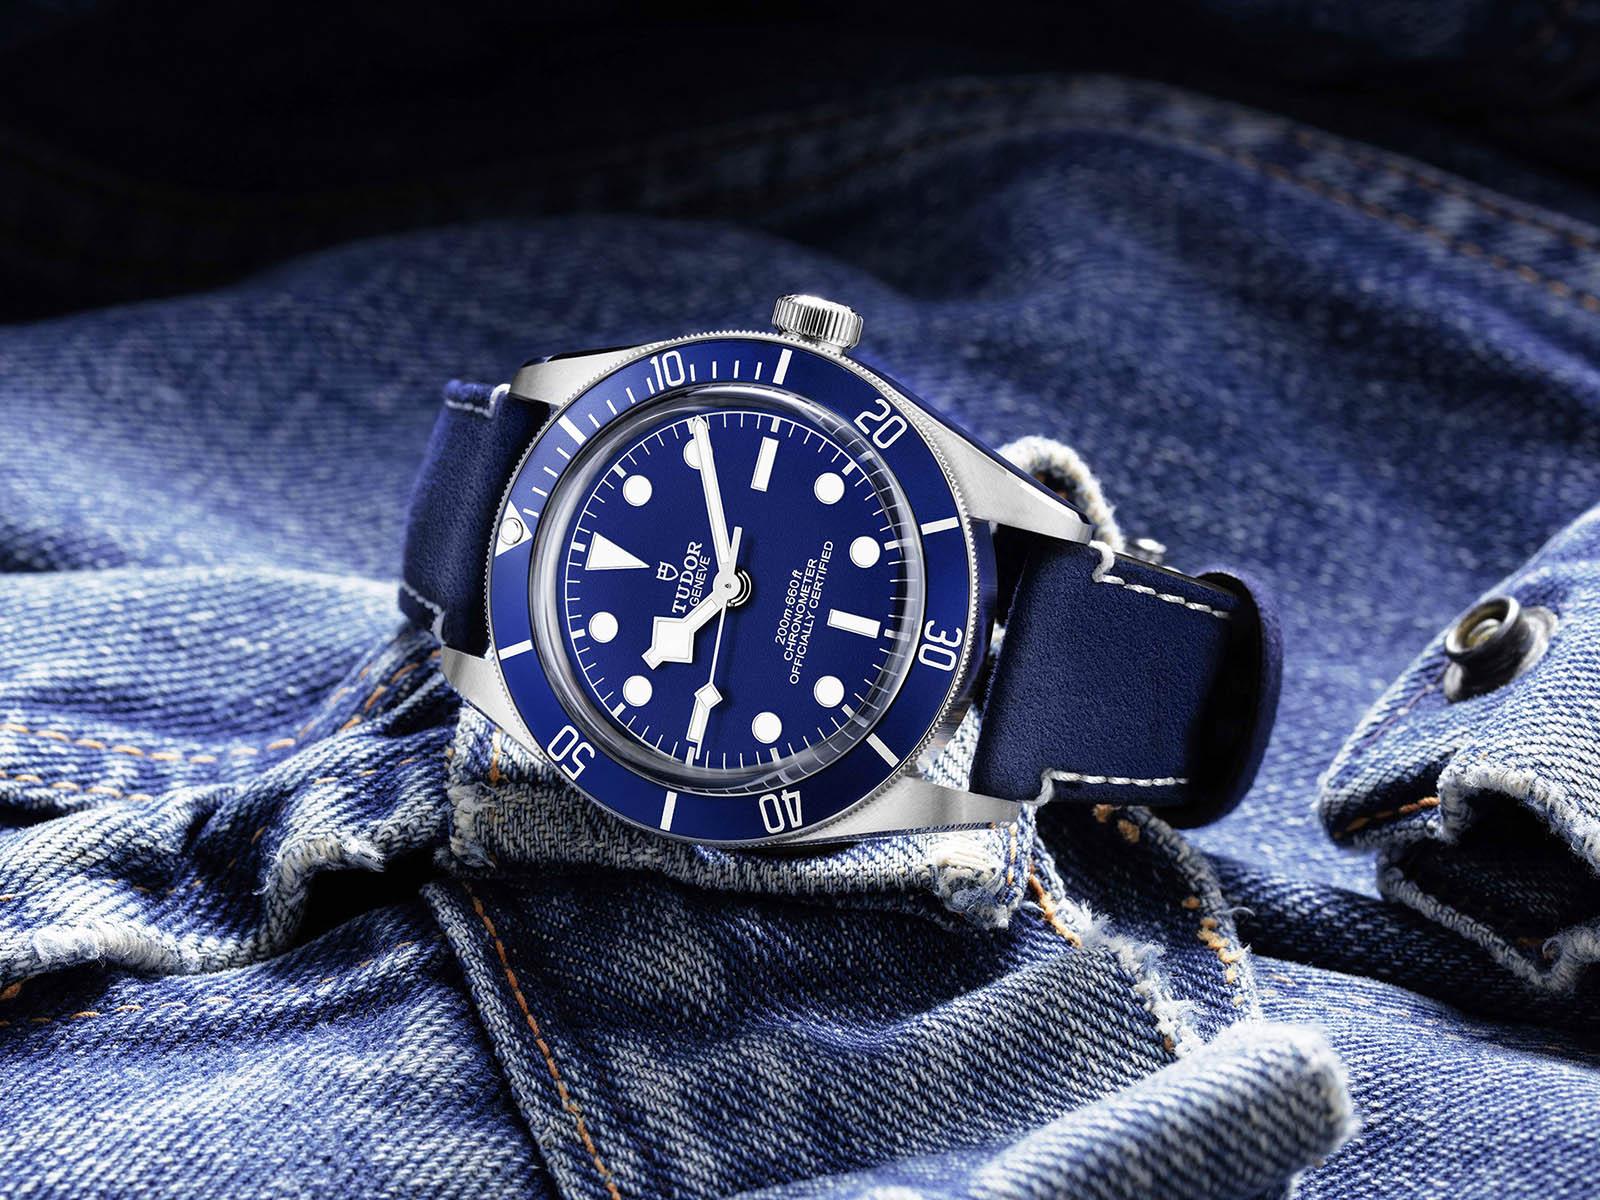 79030b-tudor-black-bay-fifty-eight-navy-blue-2.jpg